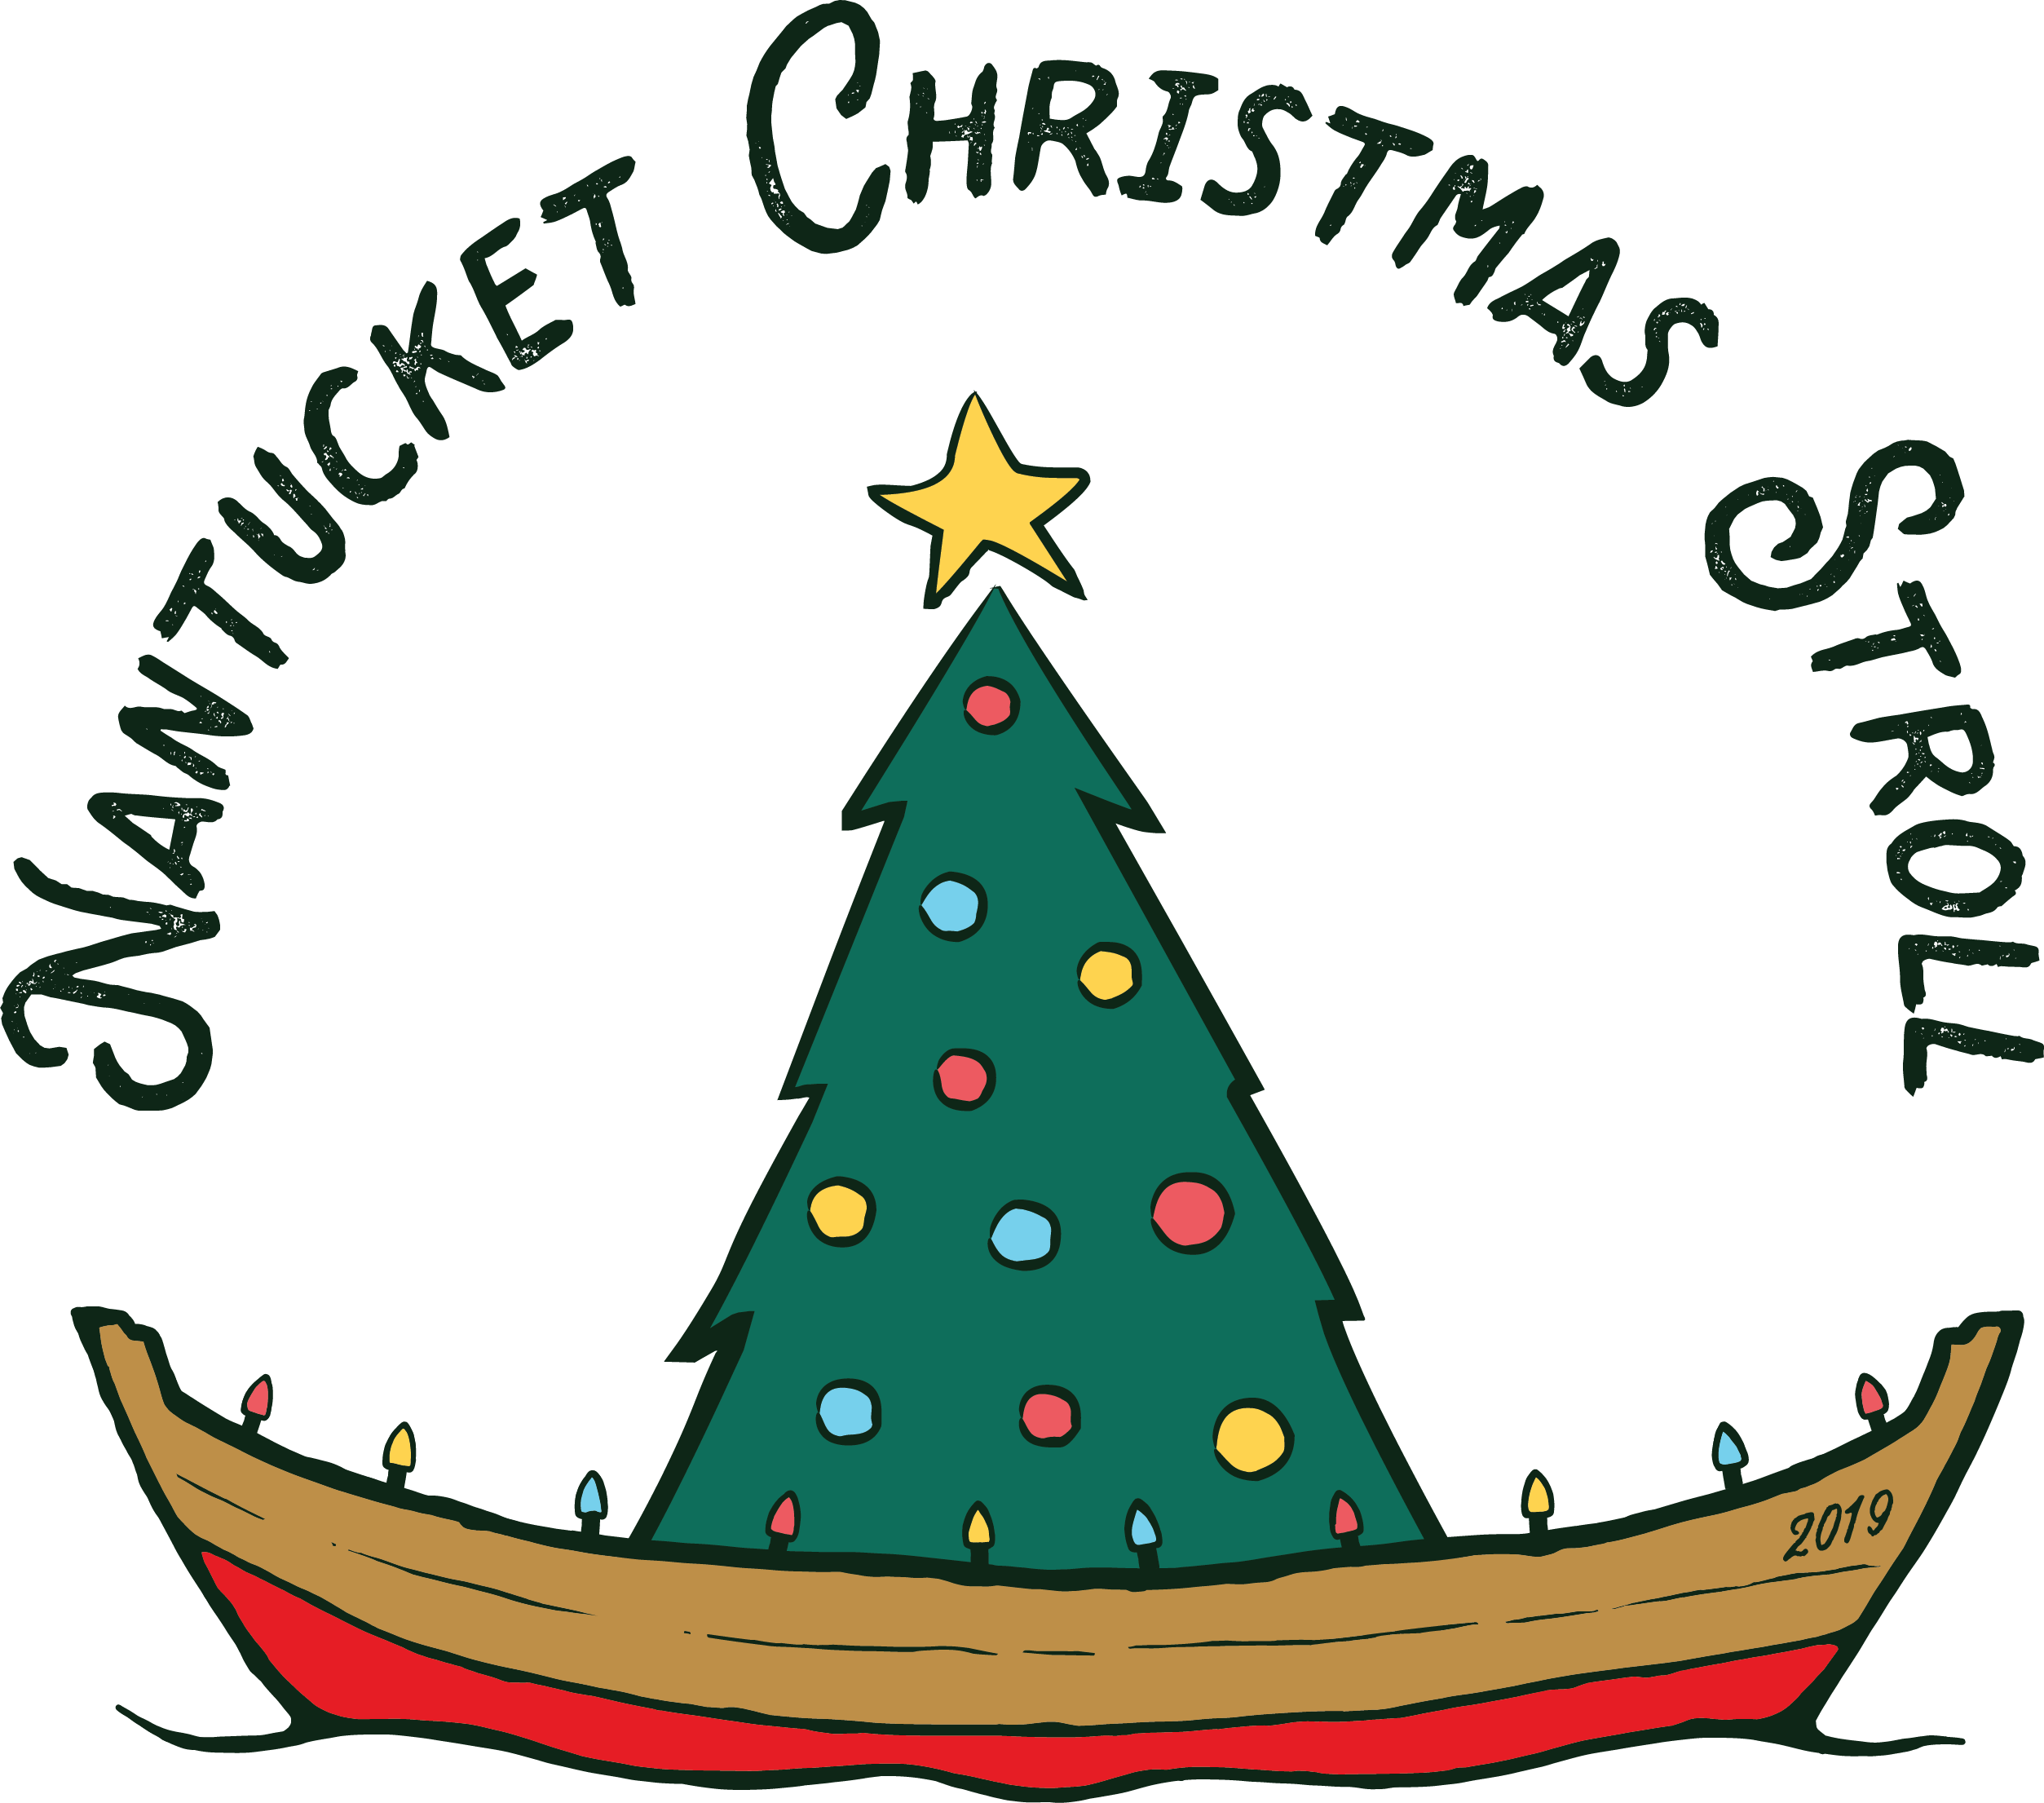 Nantucket Christmas Stroll 2020 Nantucket Stroll   Nantucket Island Chamber of Commerce, MA